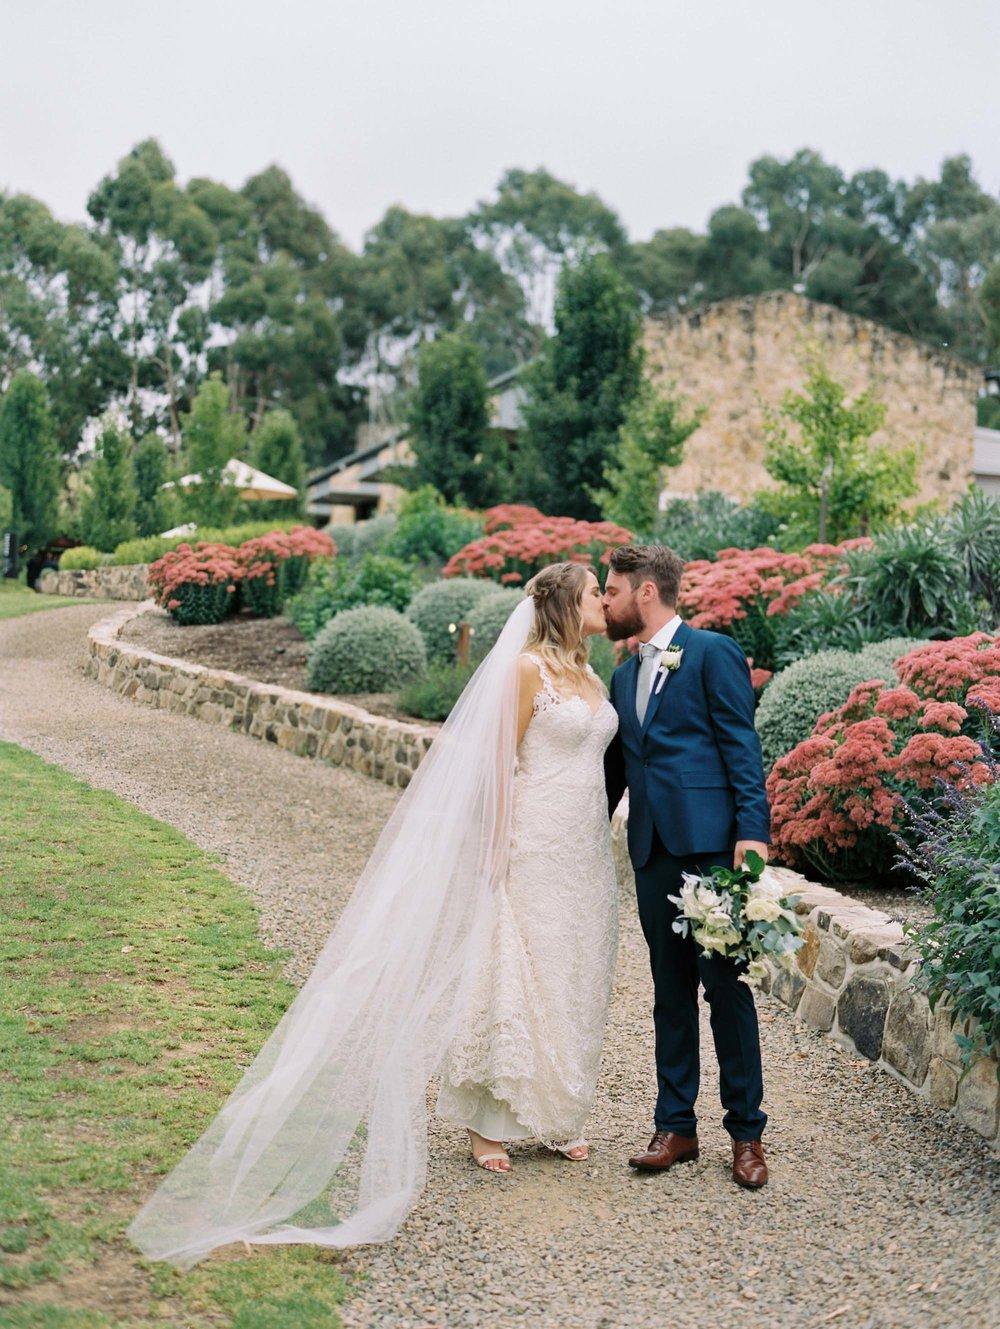 Golding-Wines-wedding-photography-077.jpg